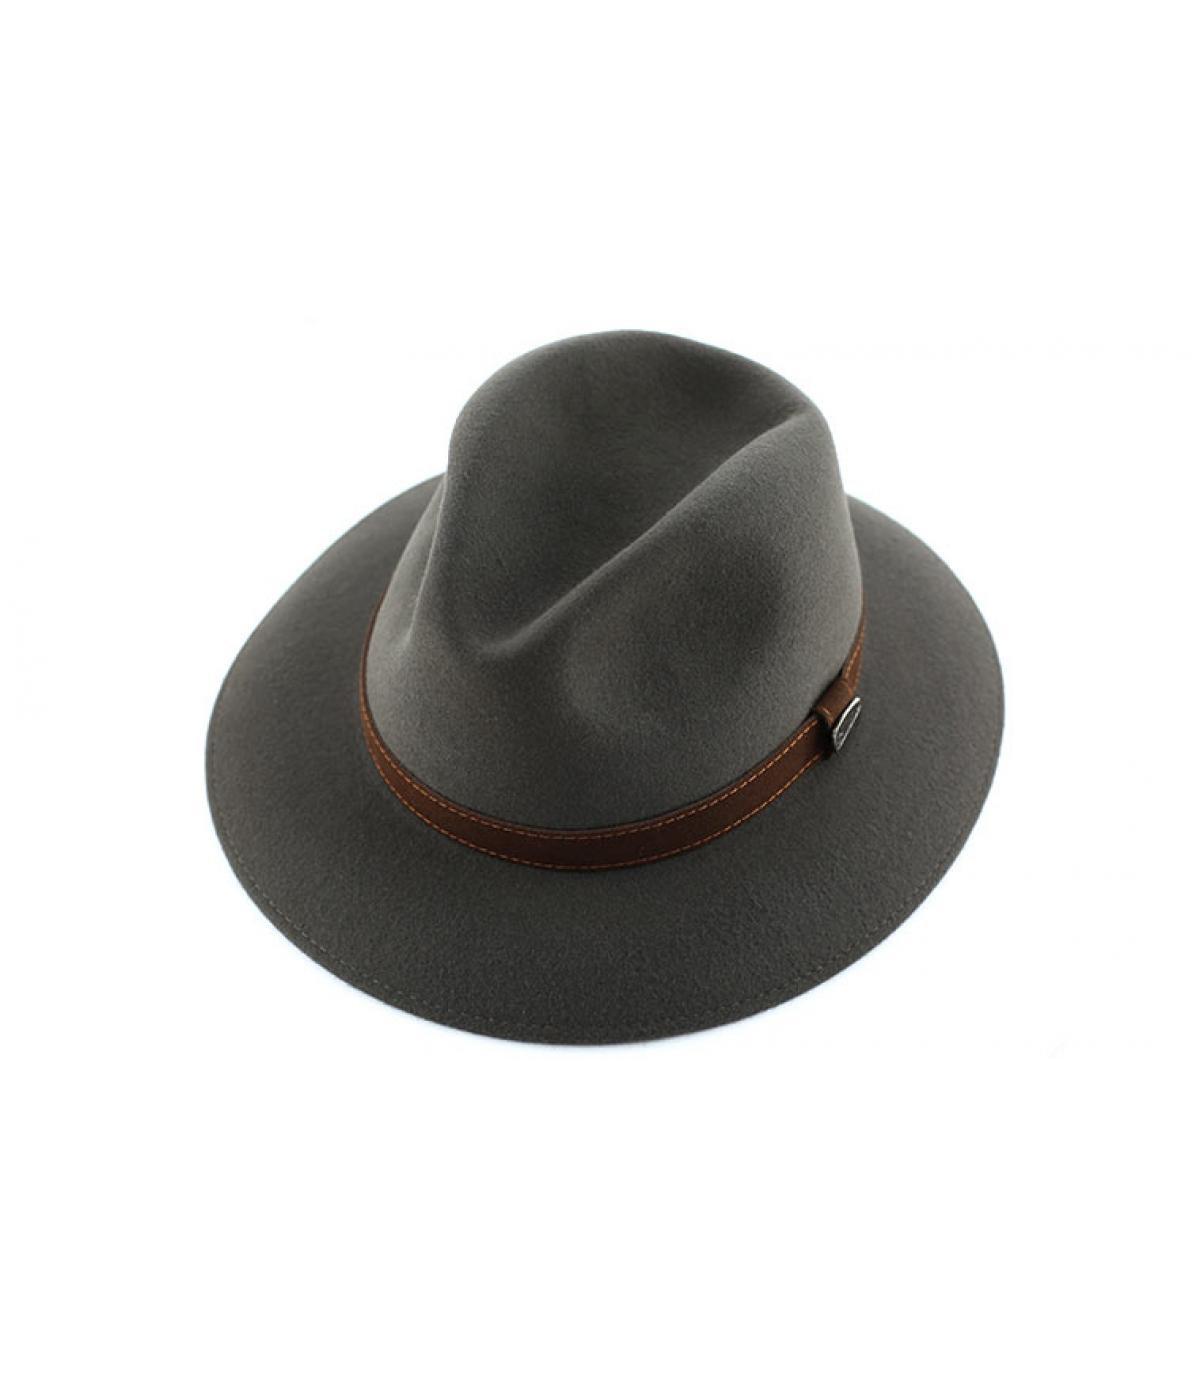 Details Alessandria grey fur felt hat - Abbildung 3